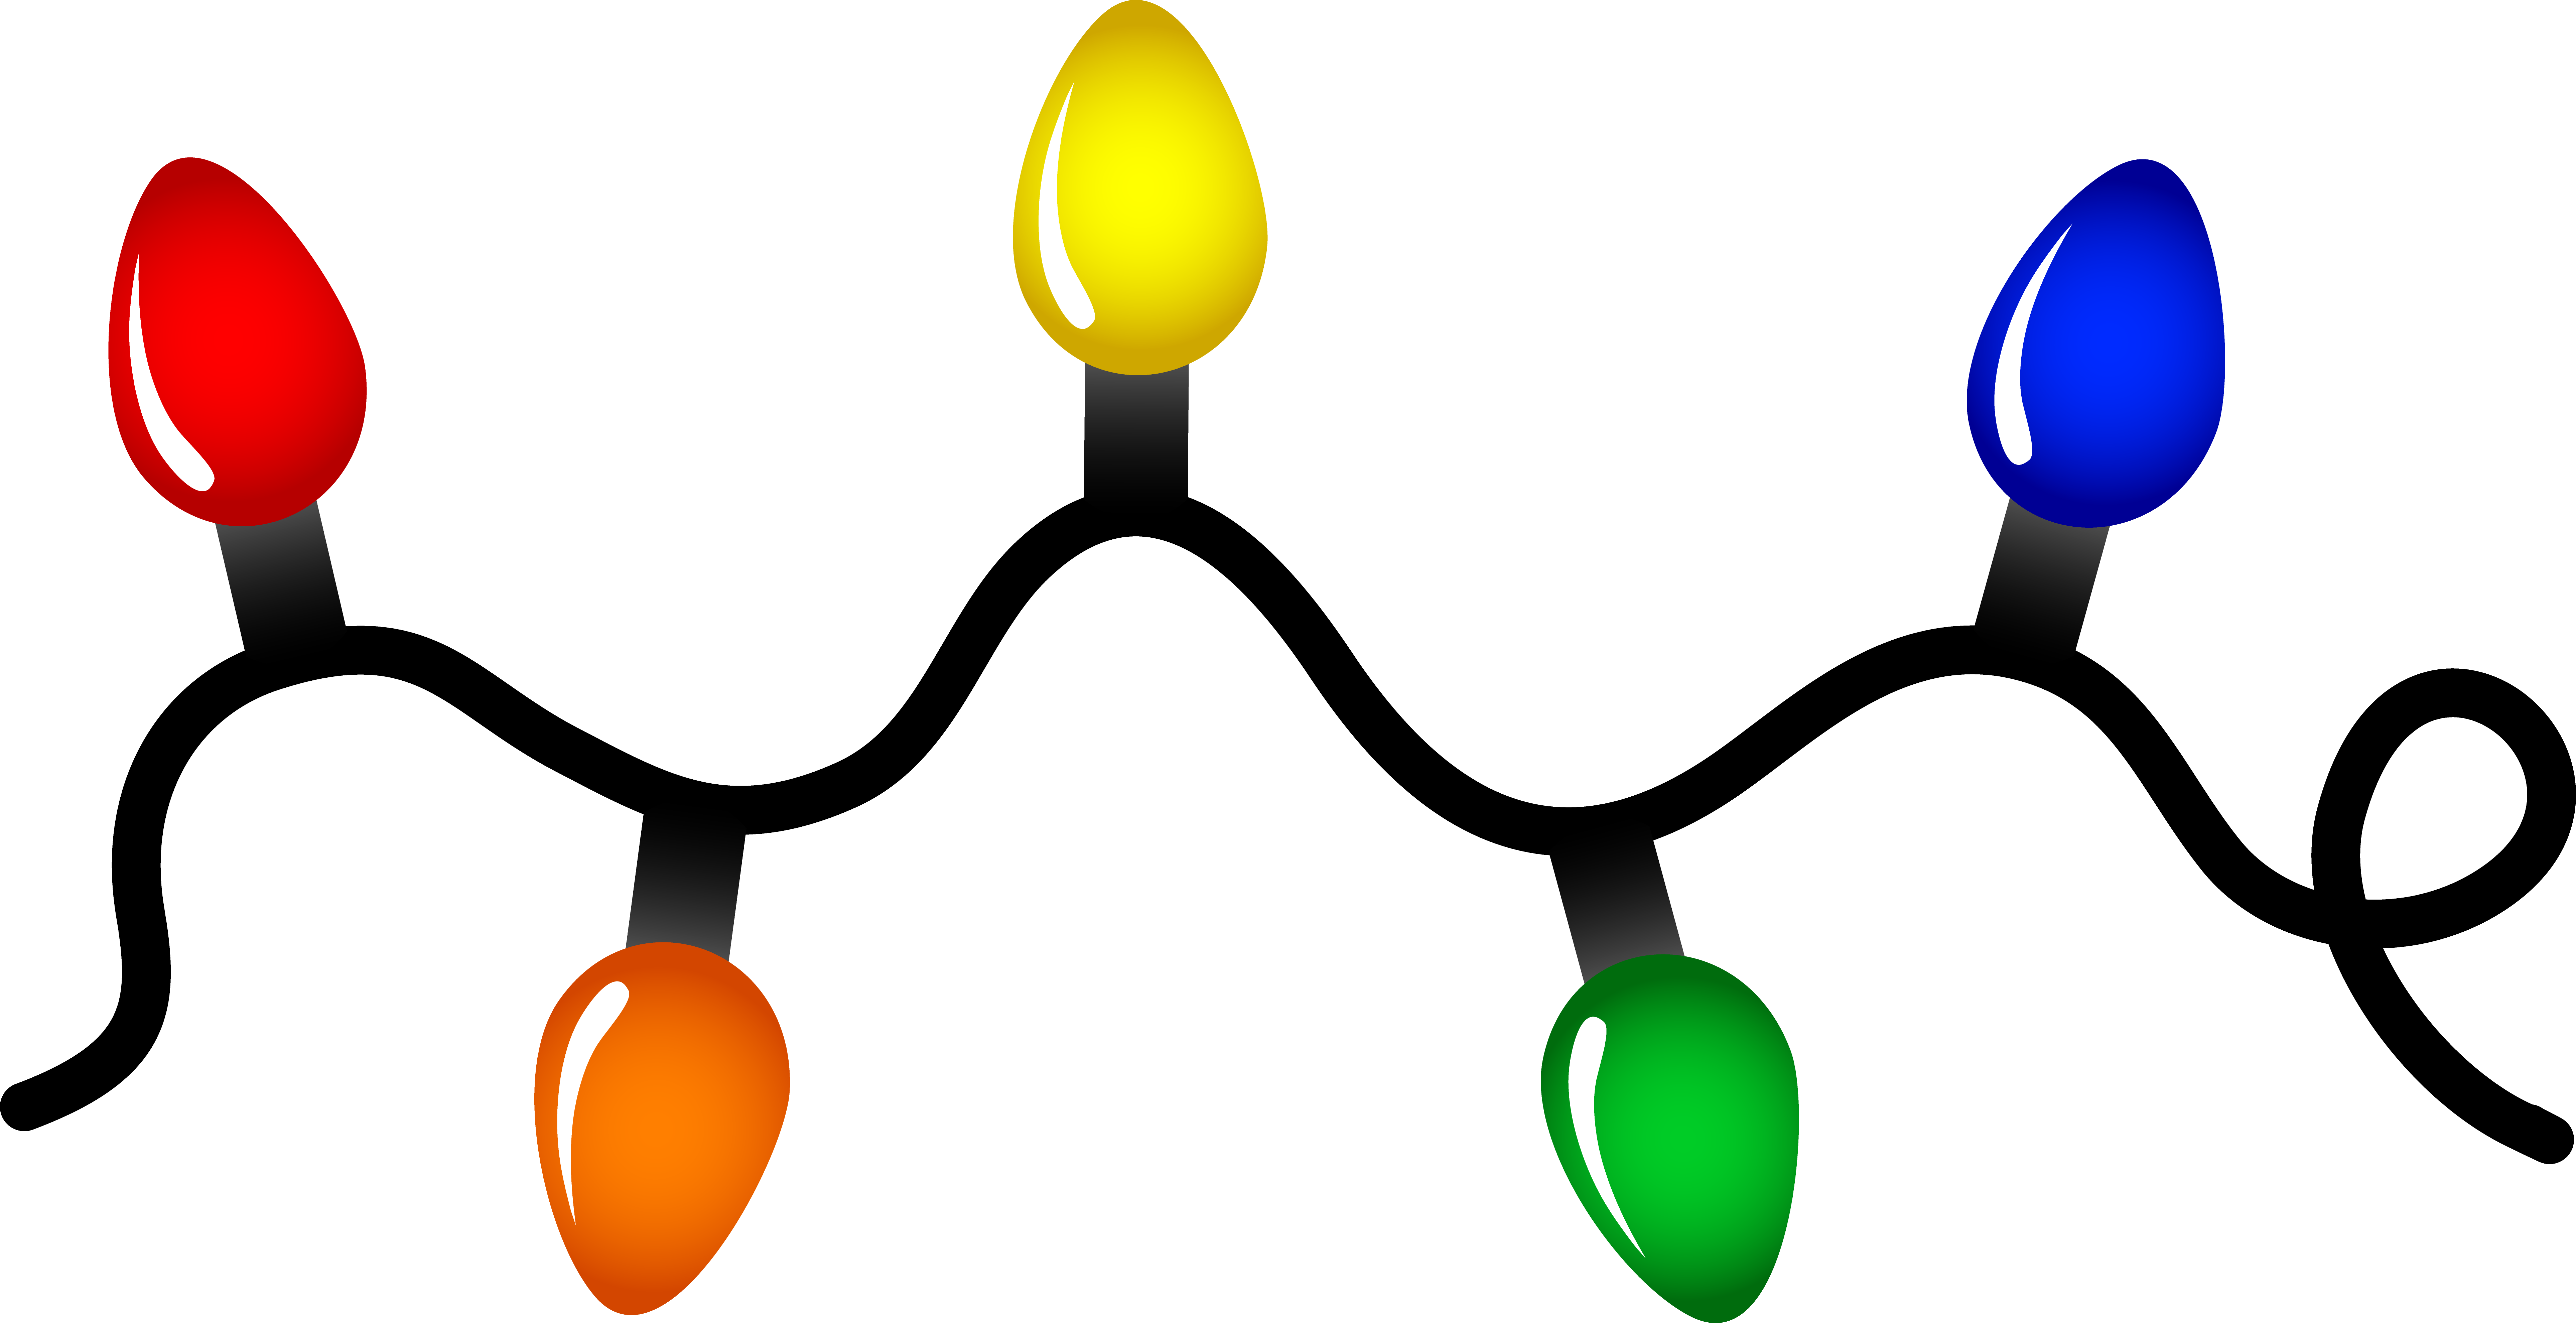 Light Bulb Clipart Black And White | Free download best Light Bulb ...